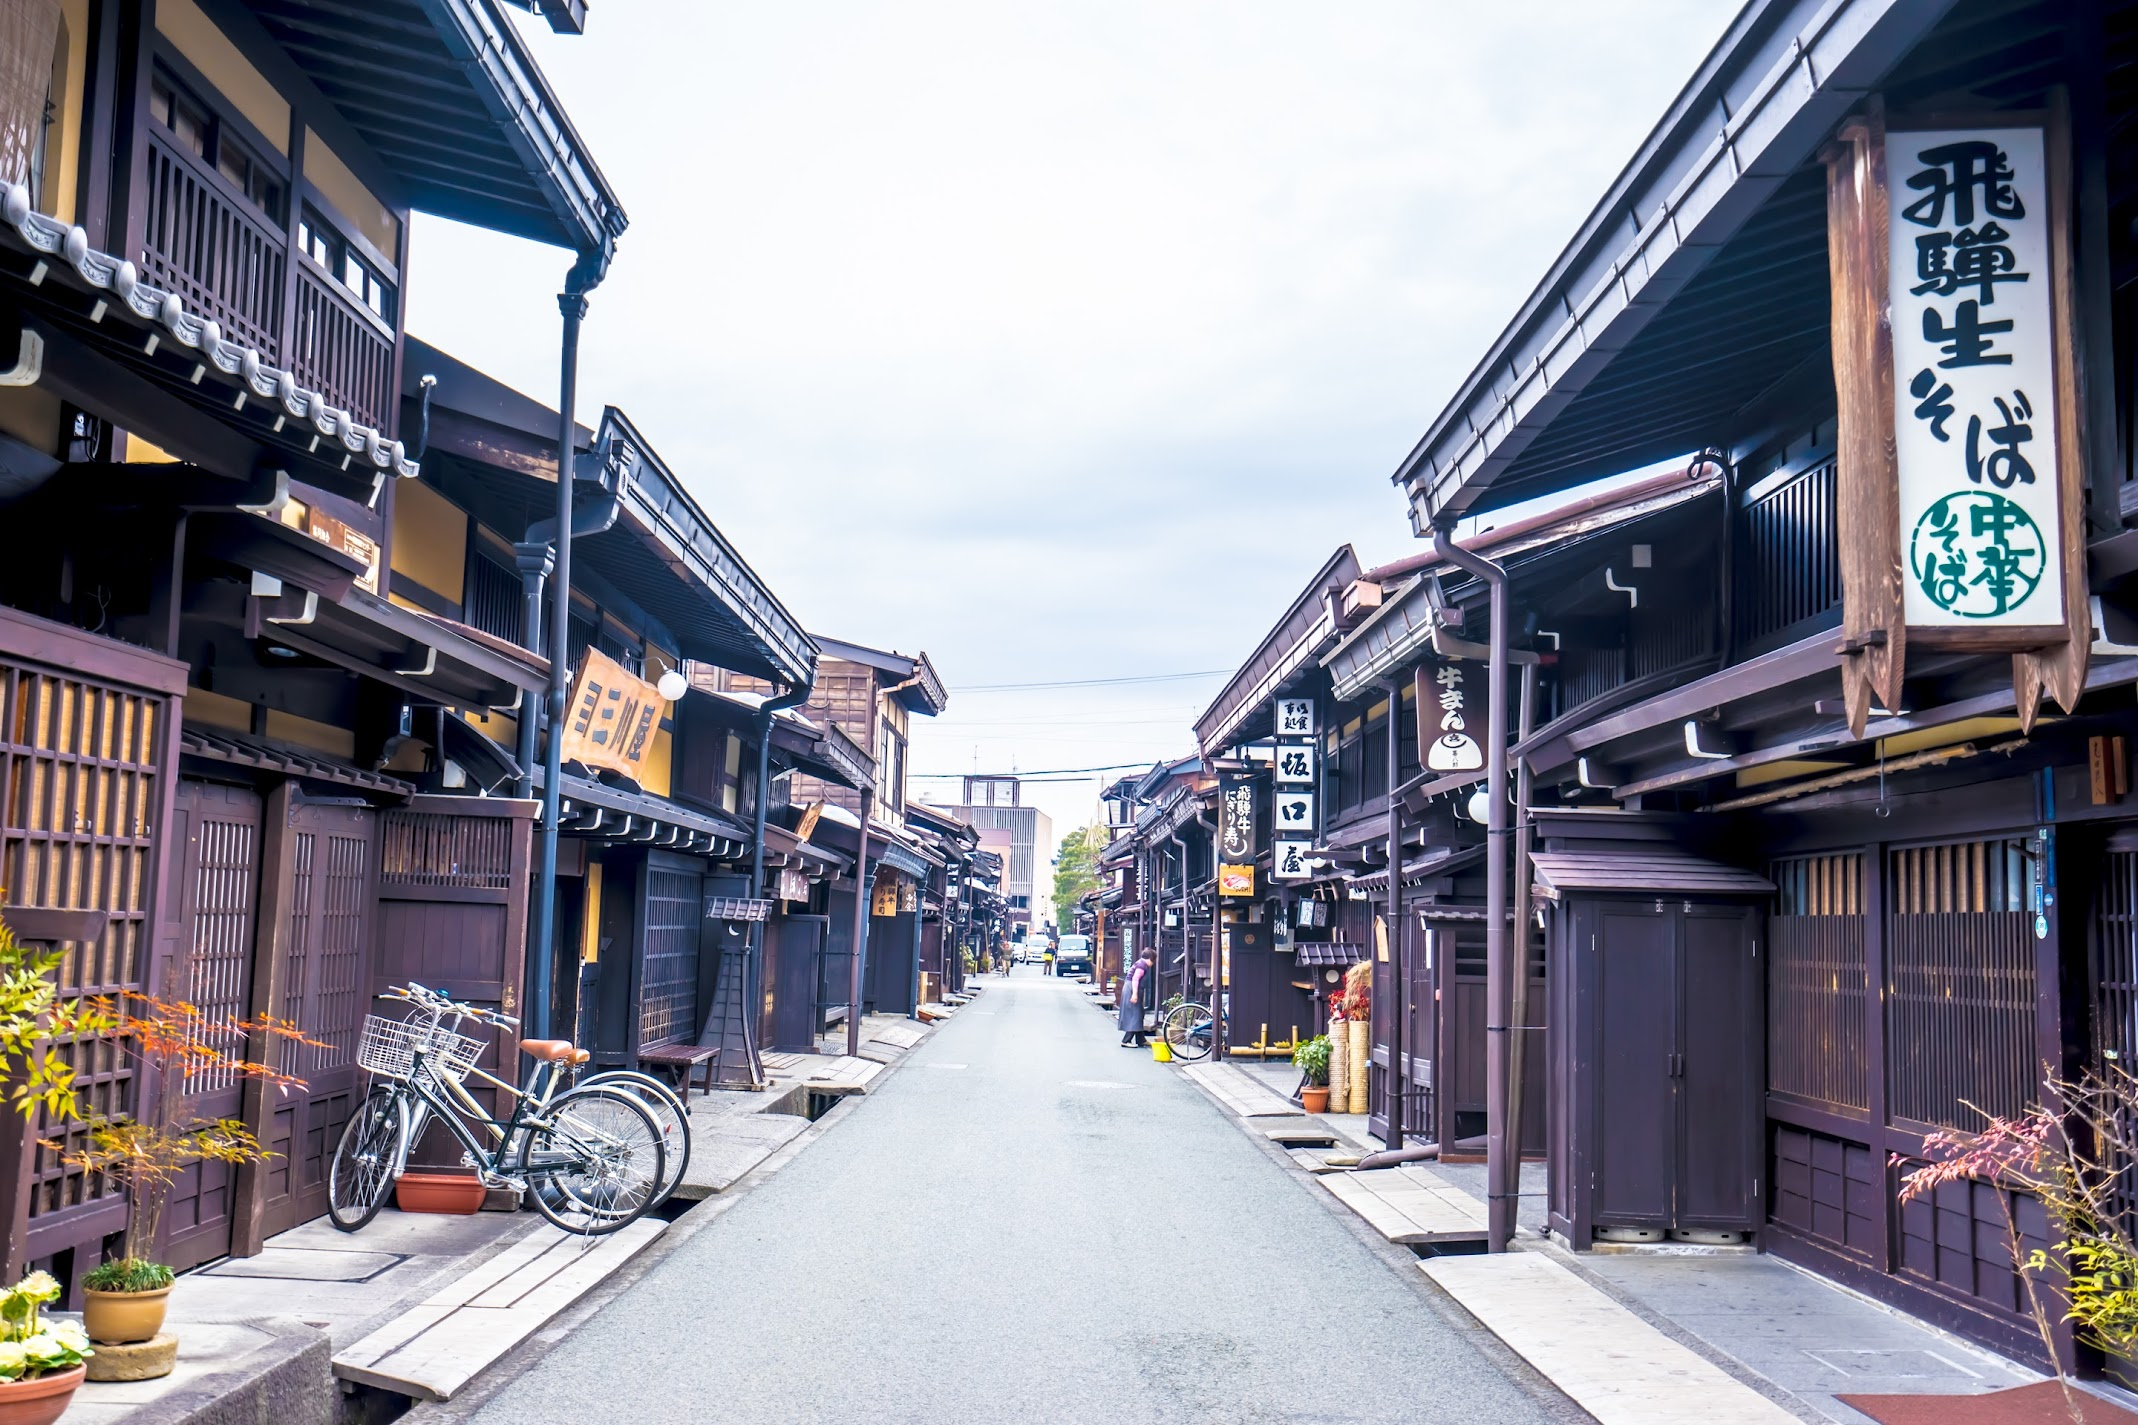 Takayama Sanmachi4